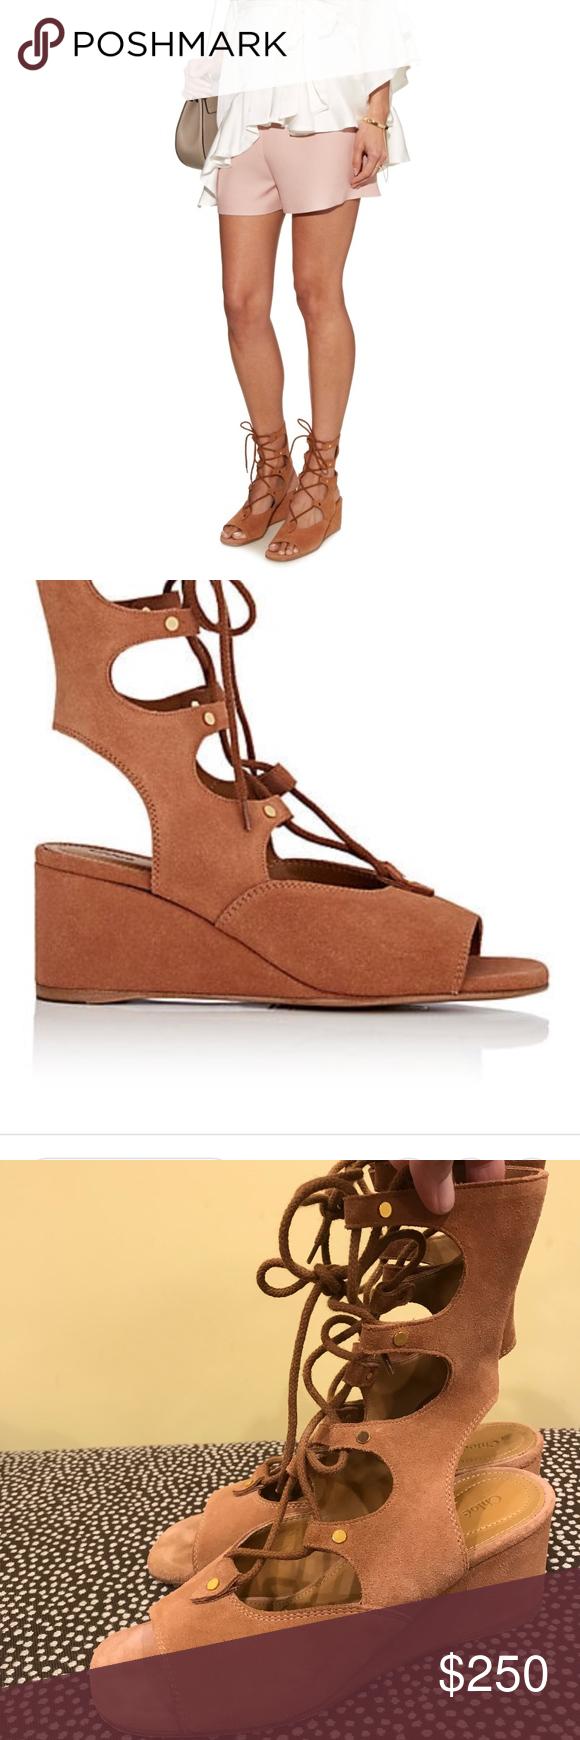 6911096aed5 Chloe Foster Suede Gladiator Wedge Sandals Crafted camel suede kidskin